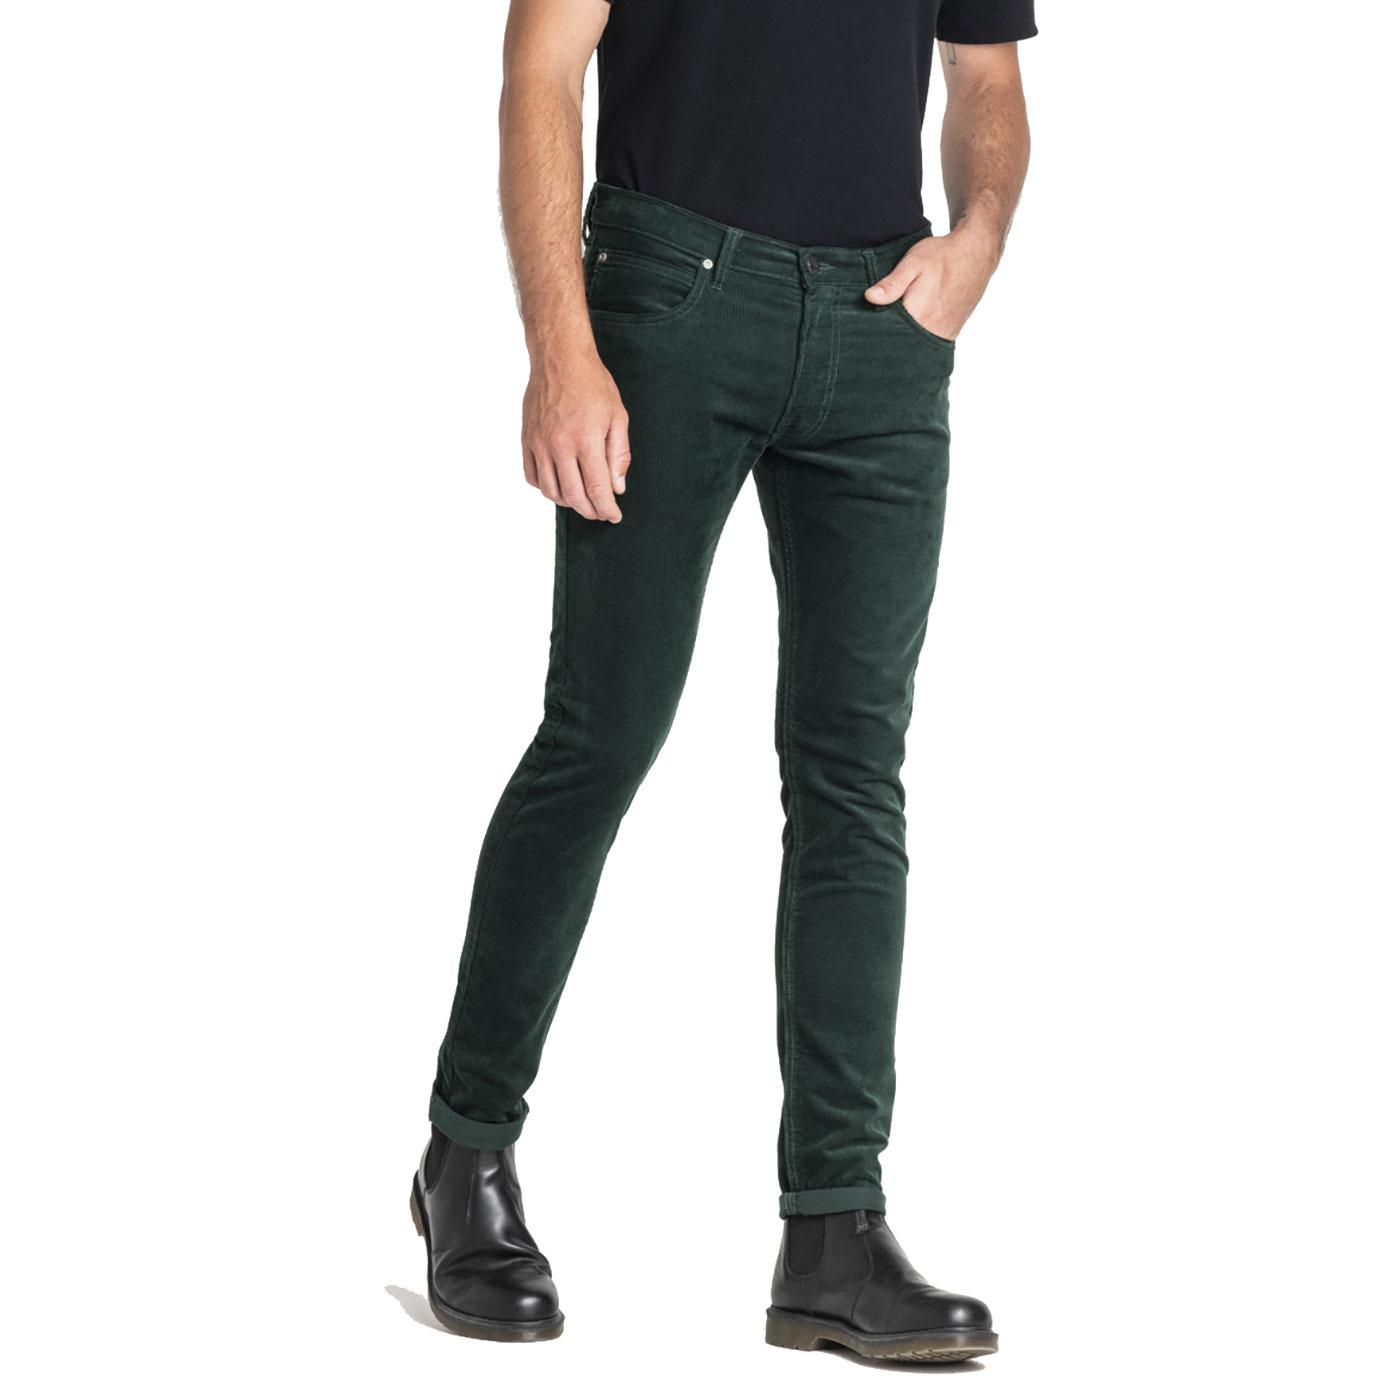 Luke LEE Retro Mod Slim Tapered Cord Jeans PG